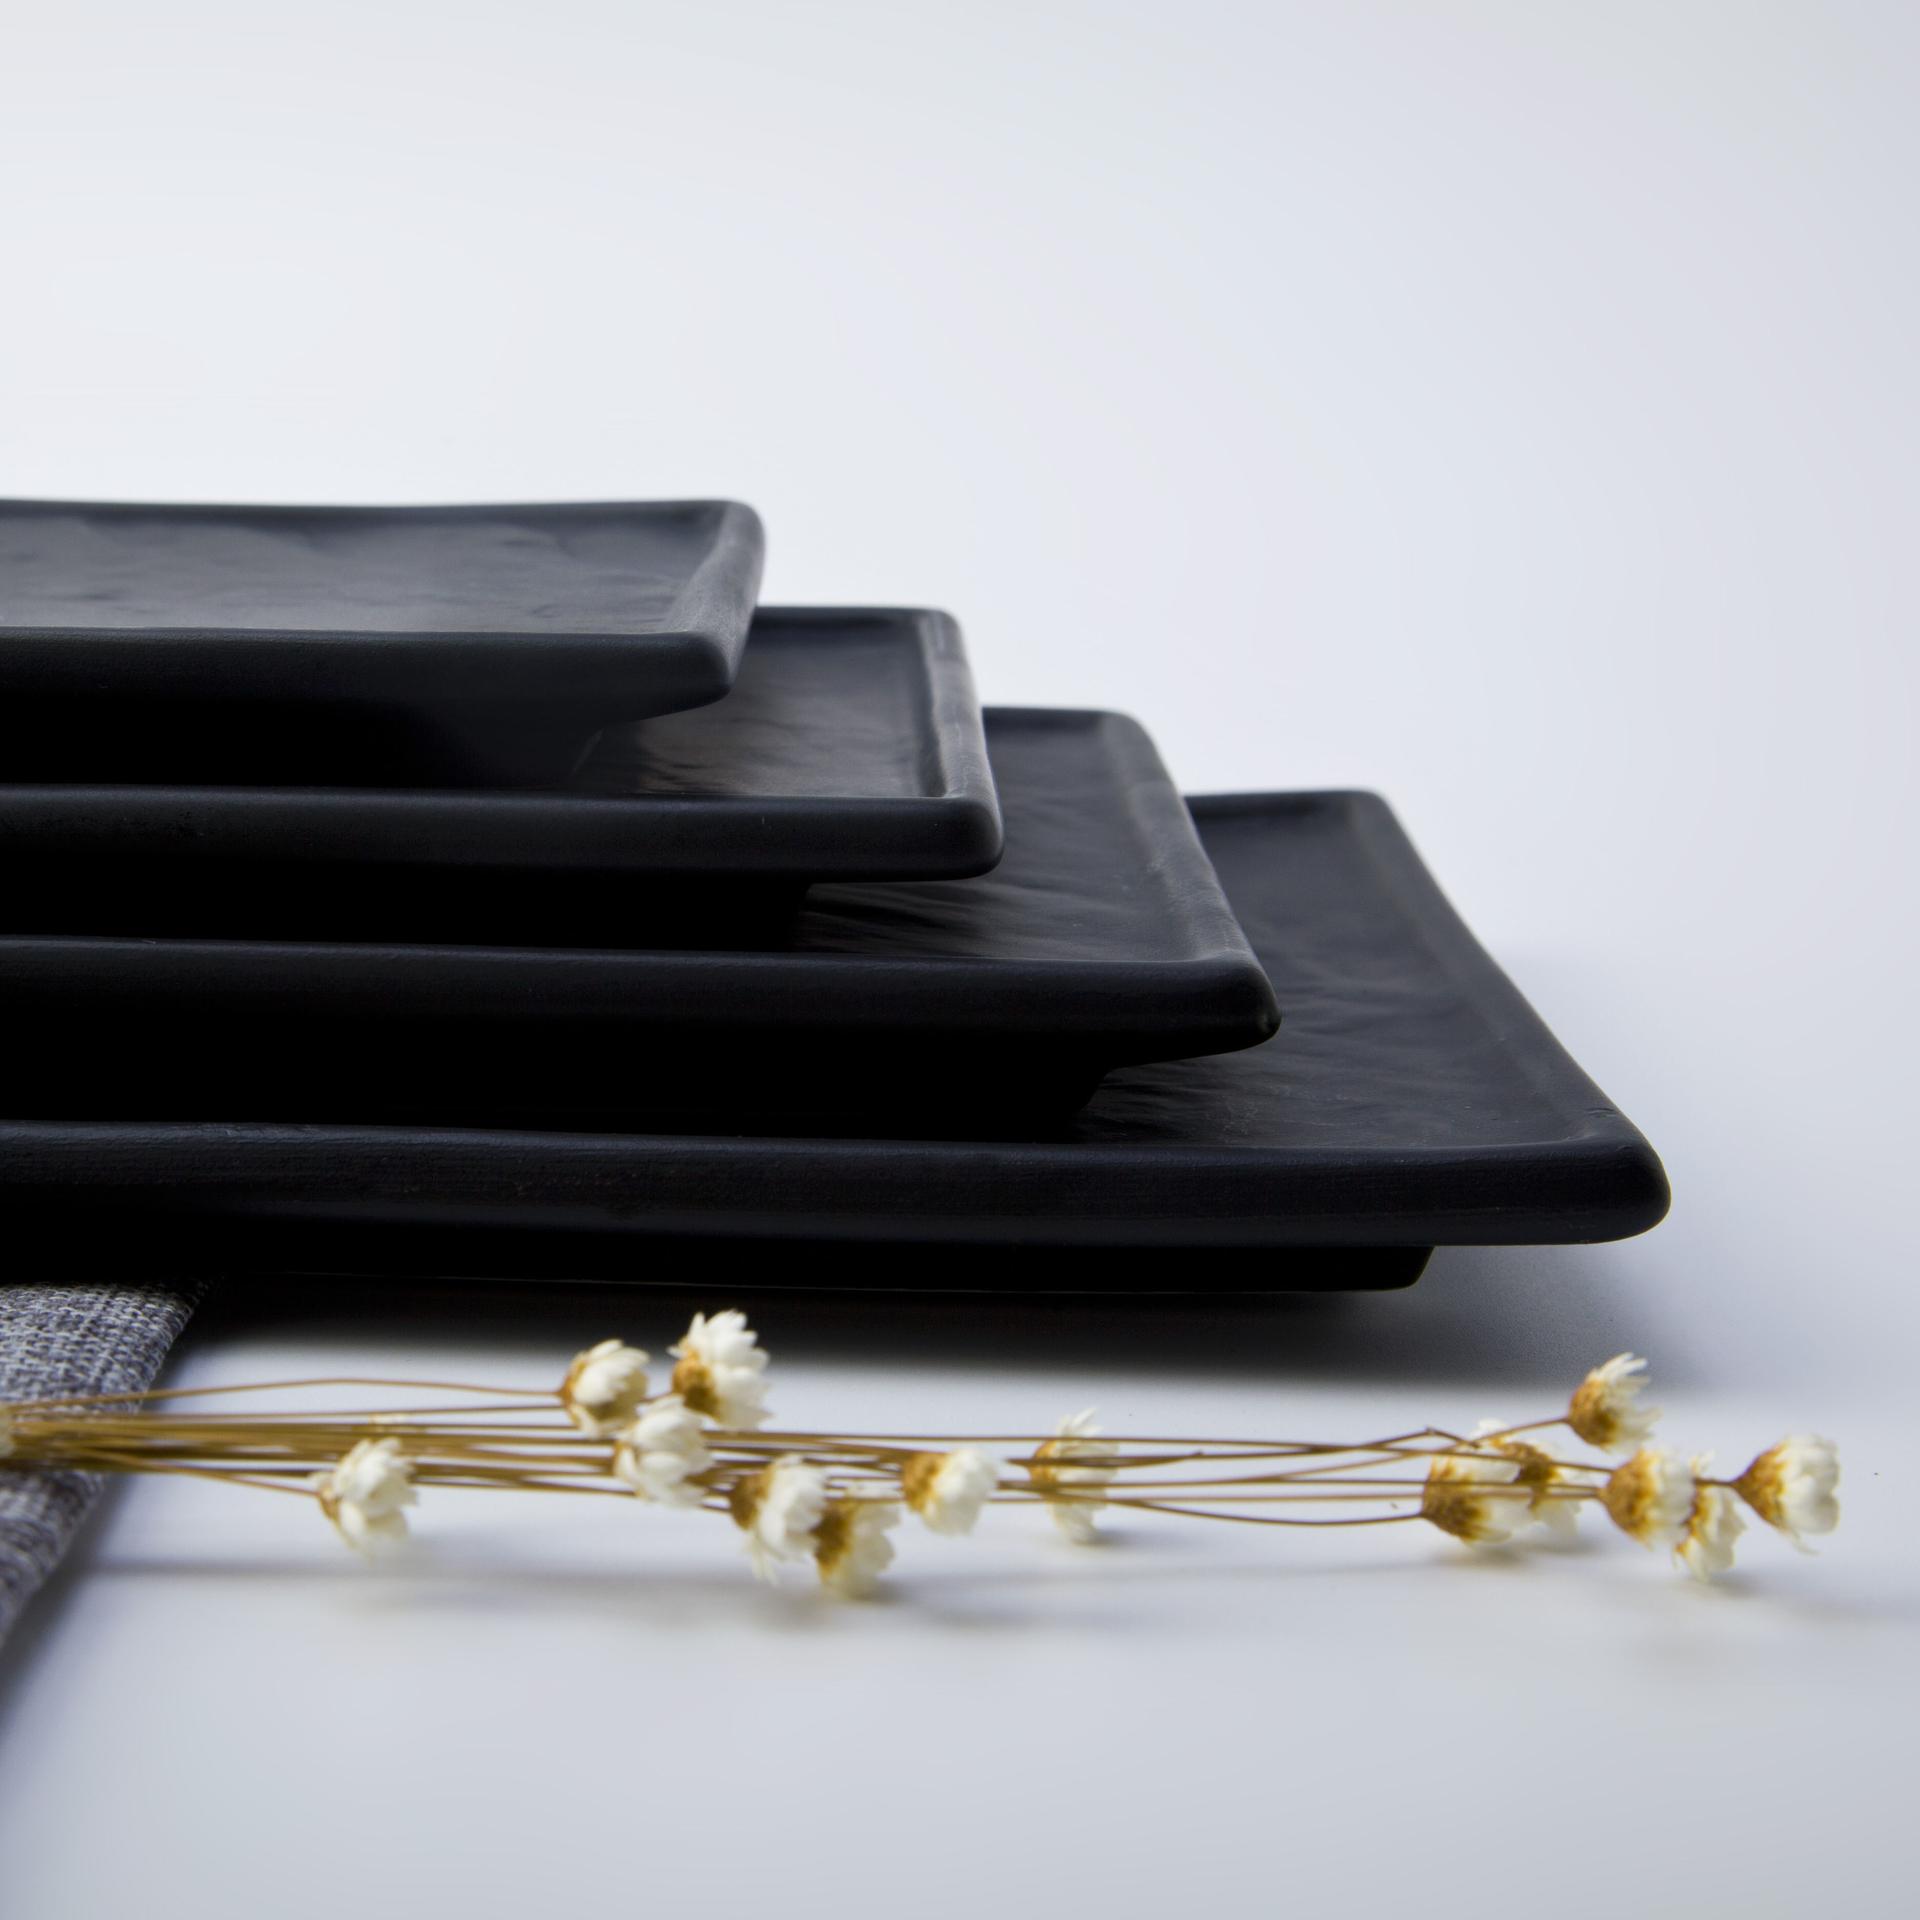 New Zealand Event&Party&Wedding Hire Plate Ceramic Dinner Plates Steak, Black Rectangle Catering Dinner Set Stone Steak Plate